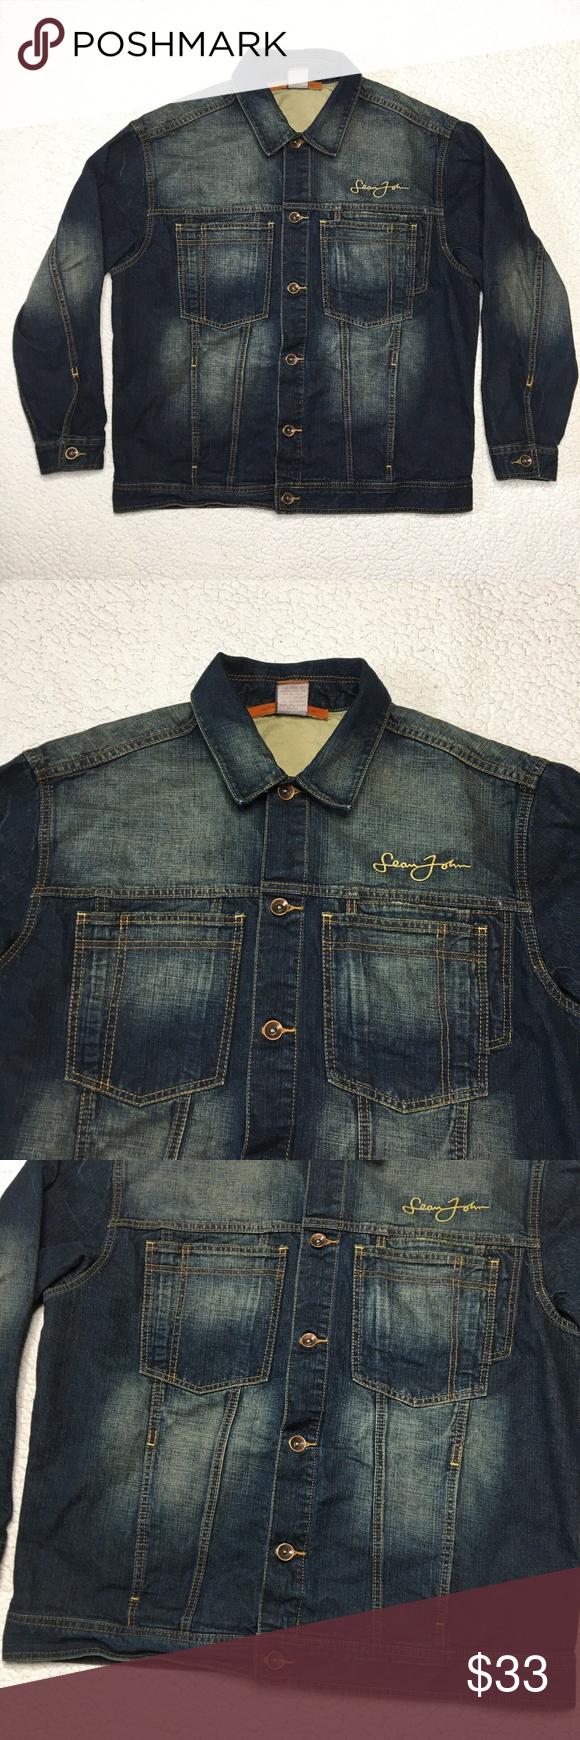 Sean John Denim Jean Jacket Burnout Distressed Denim Jean Jacket Jean Jacket Denim Jeans [ 1740 x 580 Pixel ]